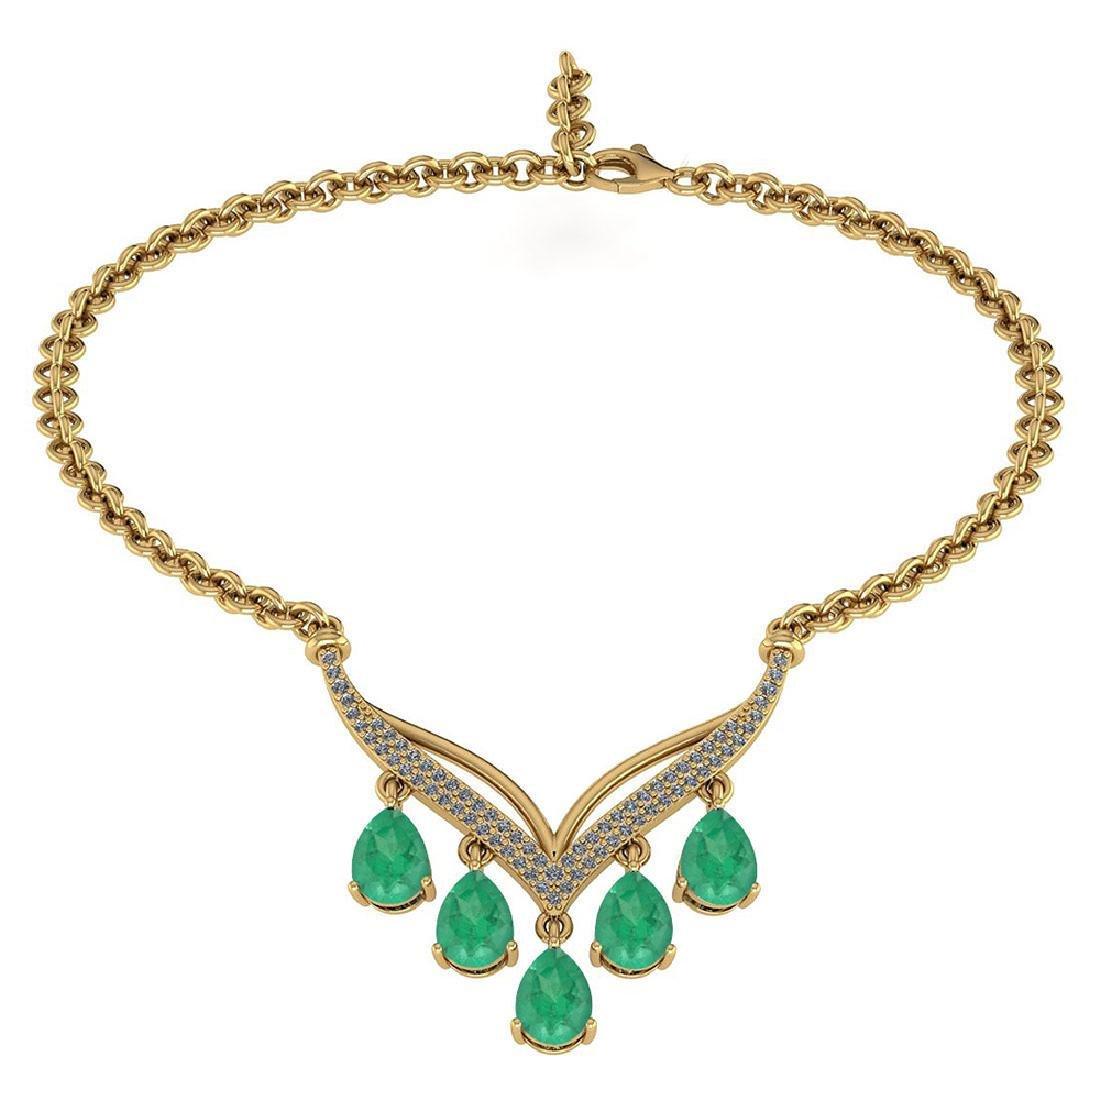 Certified 4.19 CTW Genuine Emerald And Diamond 14k Yell